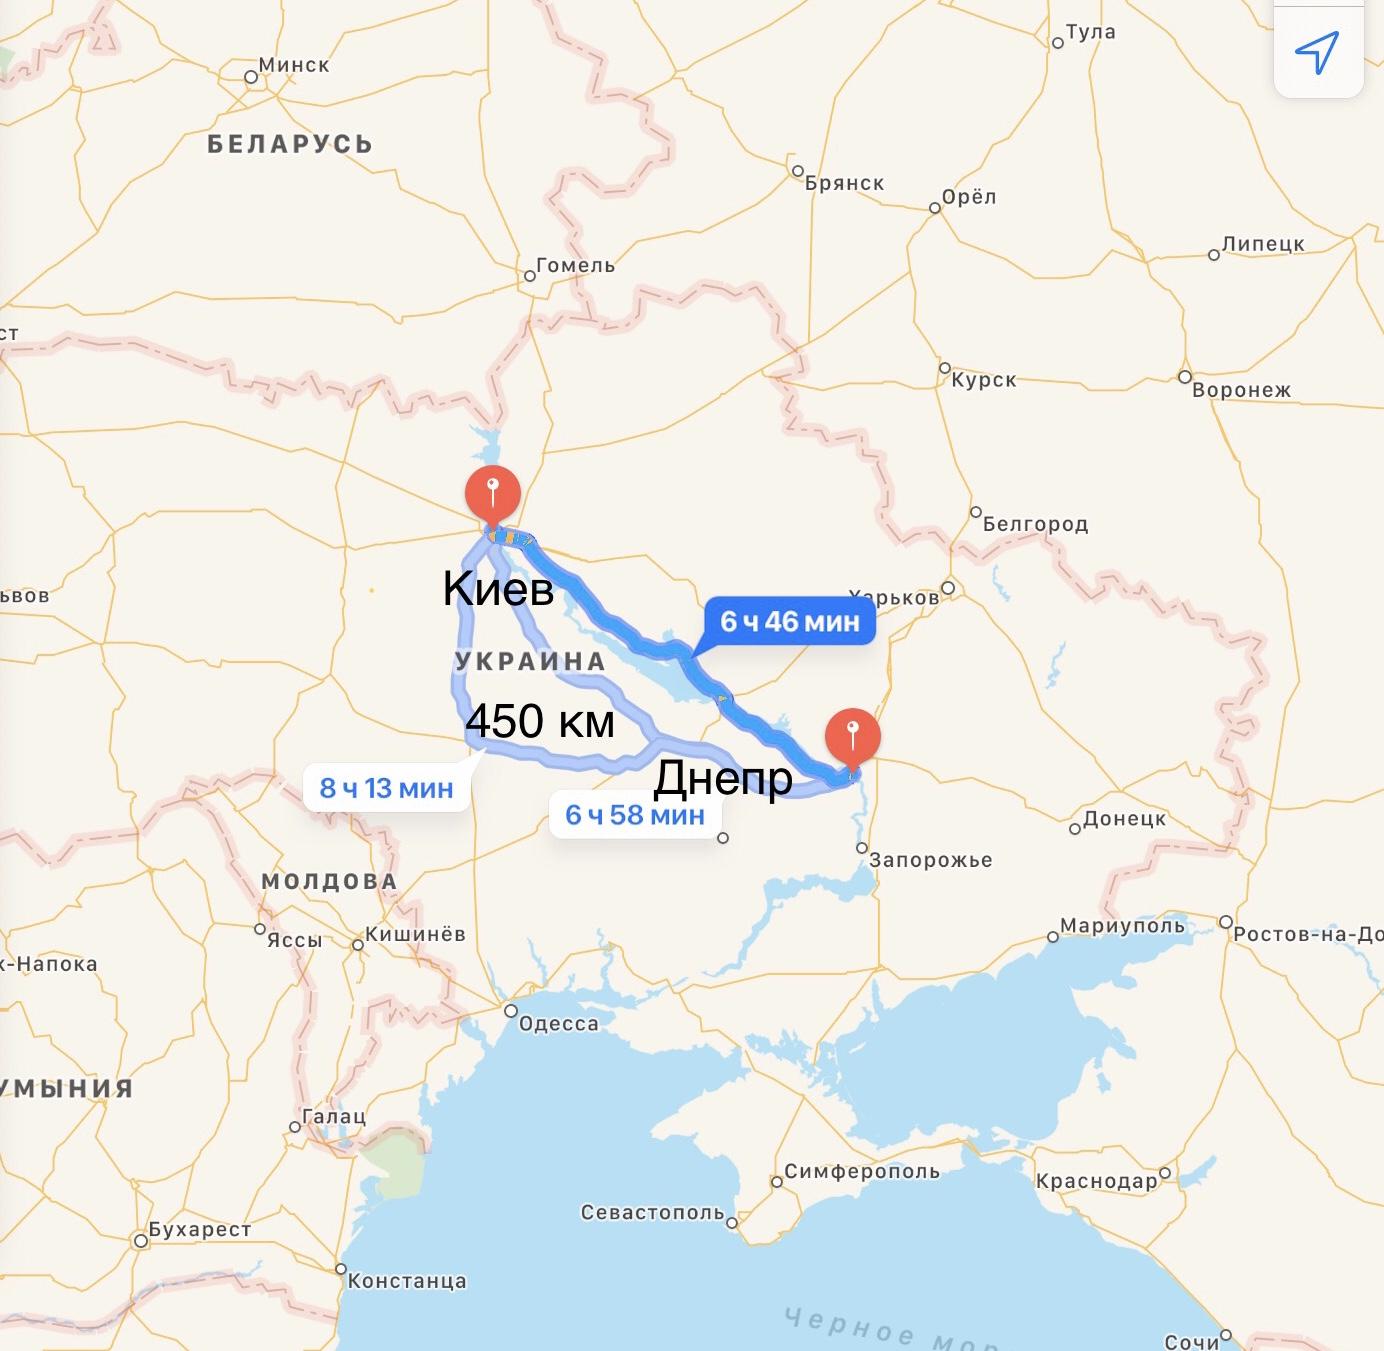 Грузоперевозки Киев – Днепр